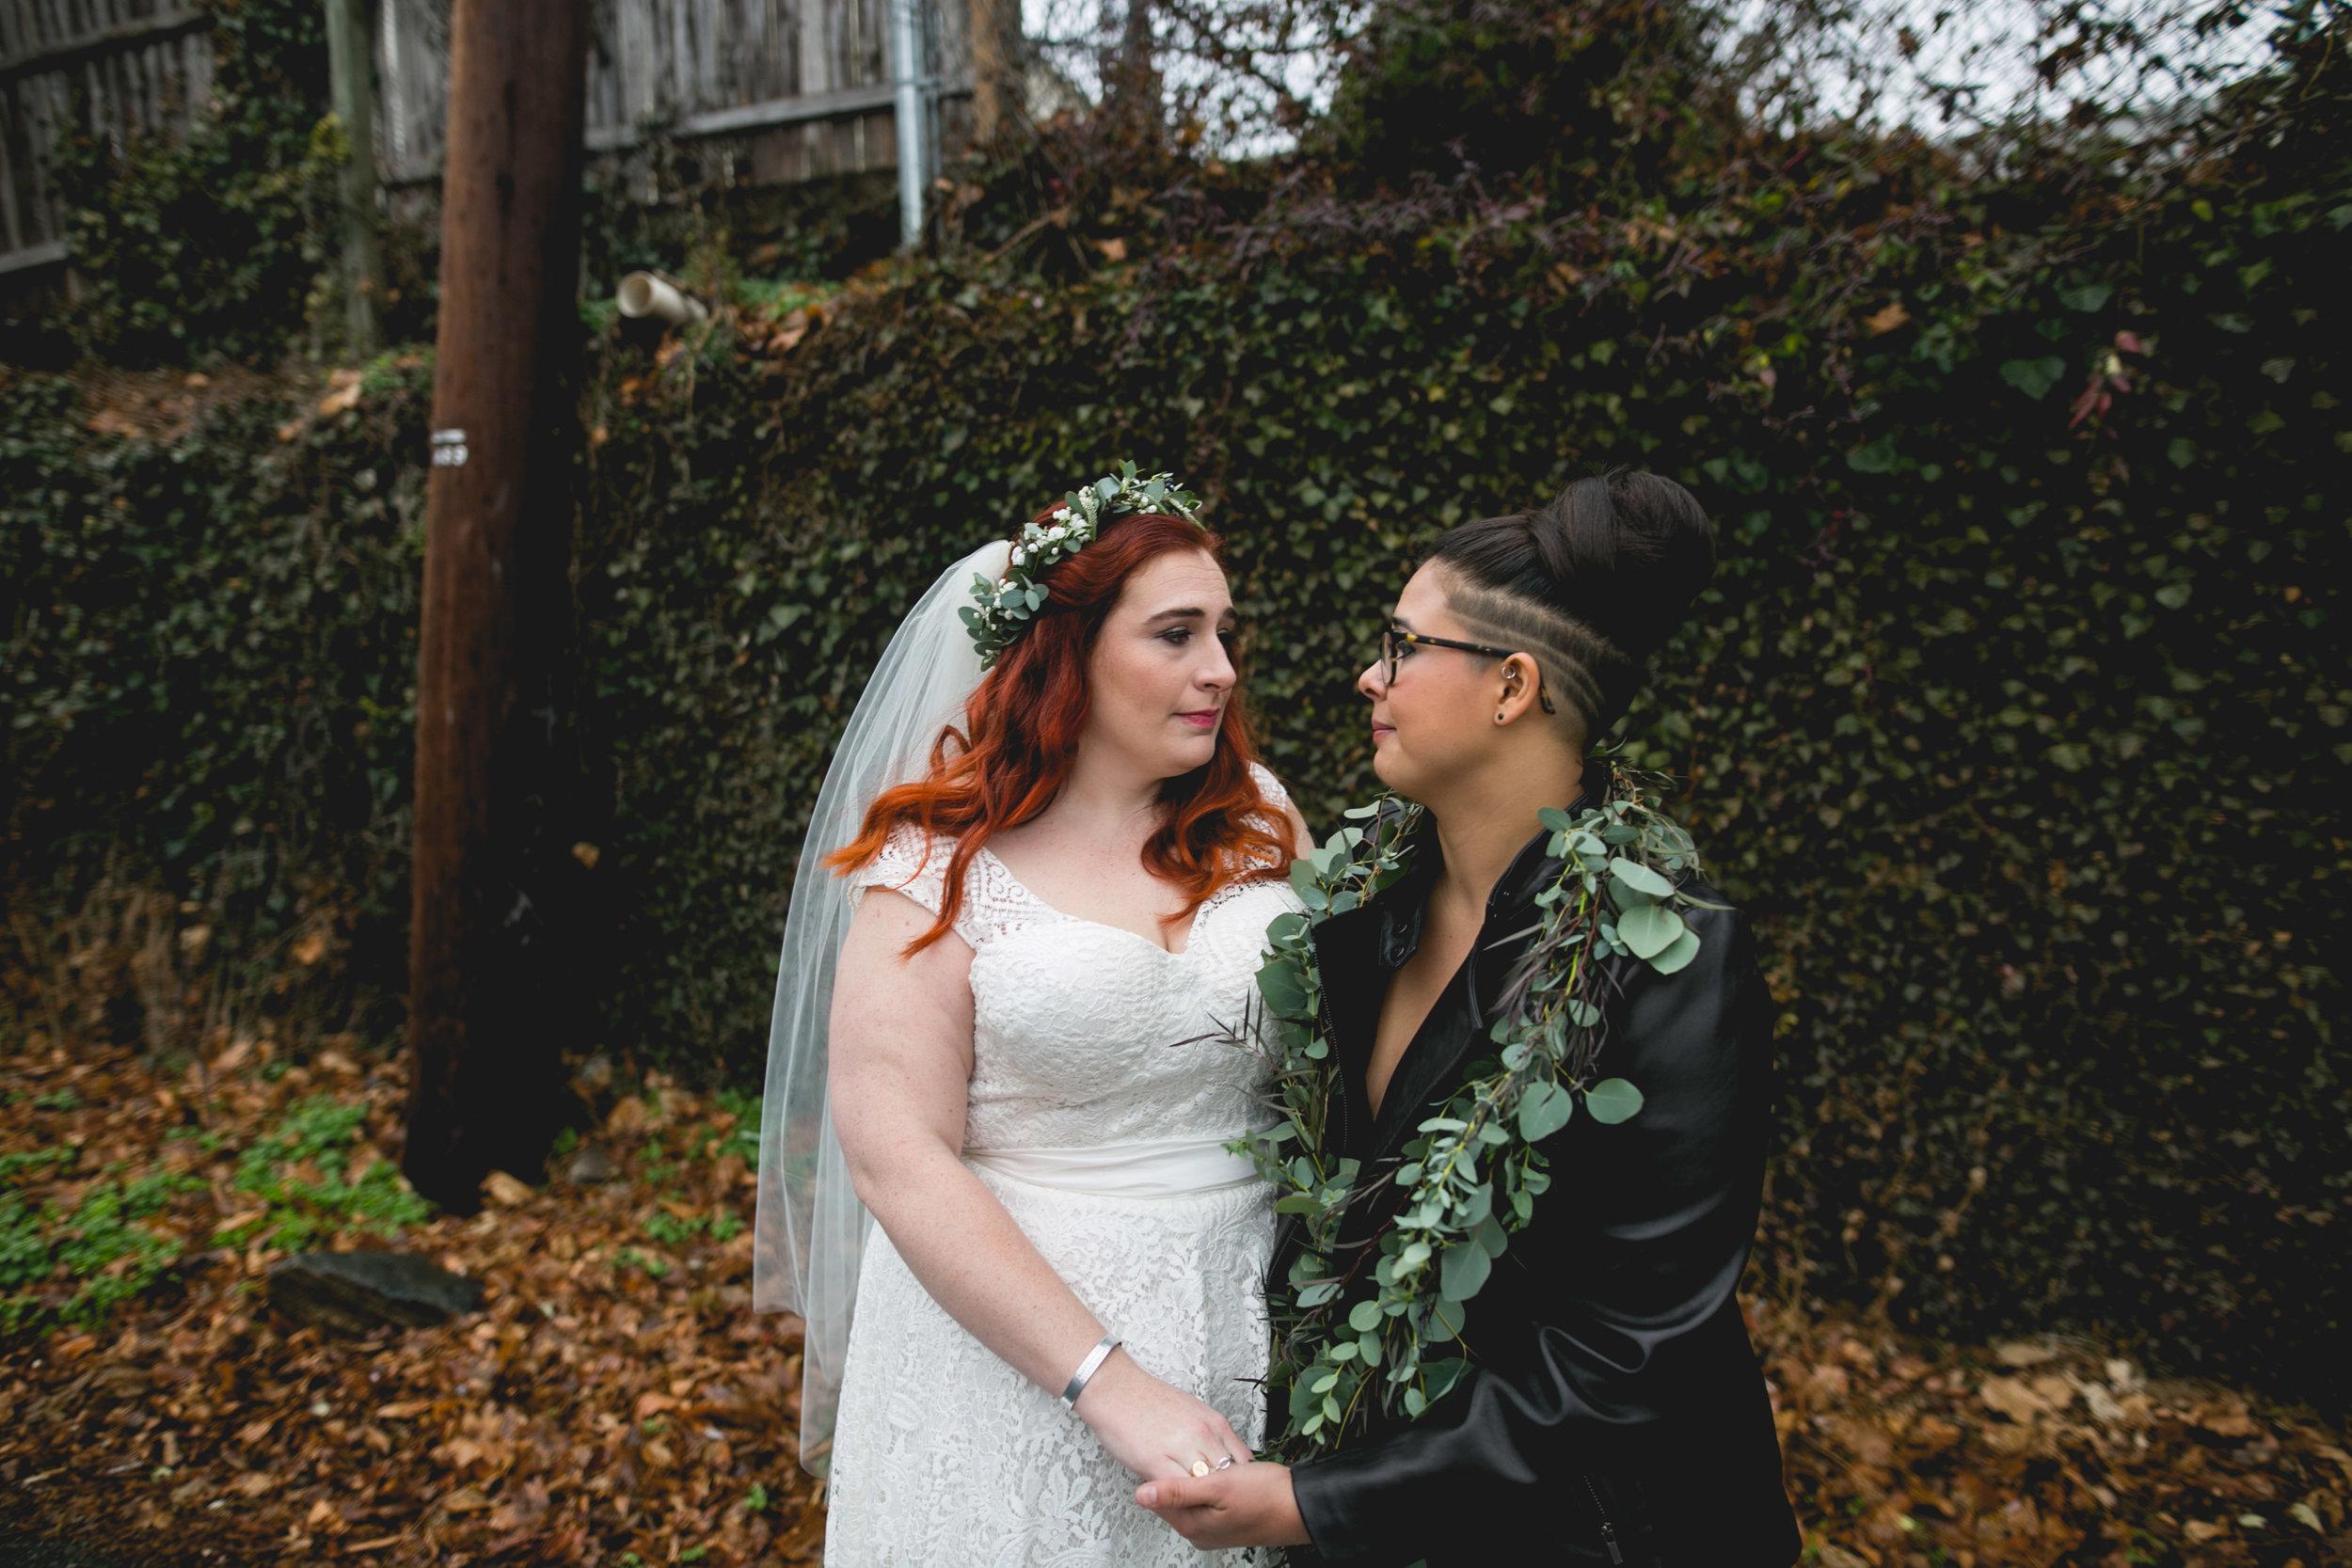 LGBTQ Philadelphia Wedding by Swiger Photography the Lesbian photographer 17